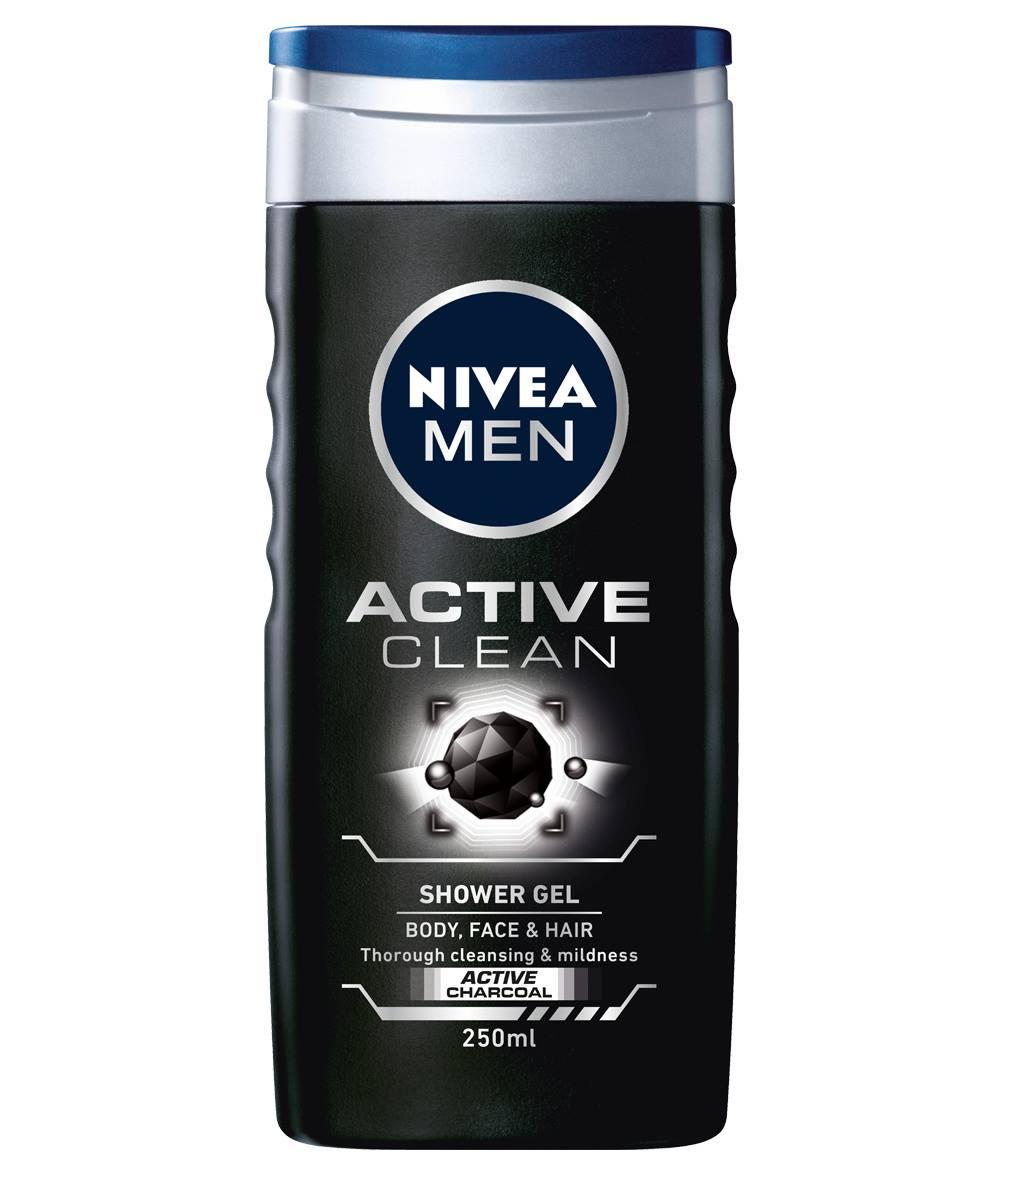 ACTIVE CLEAN SHOWER GEL shower care